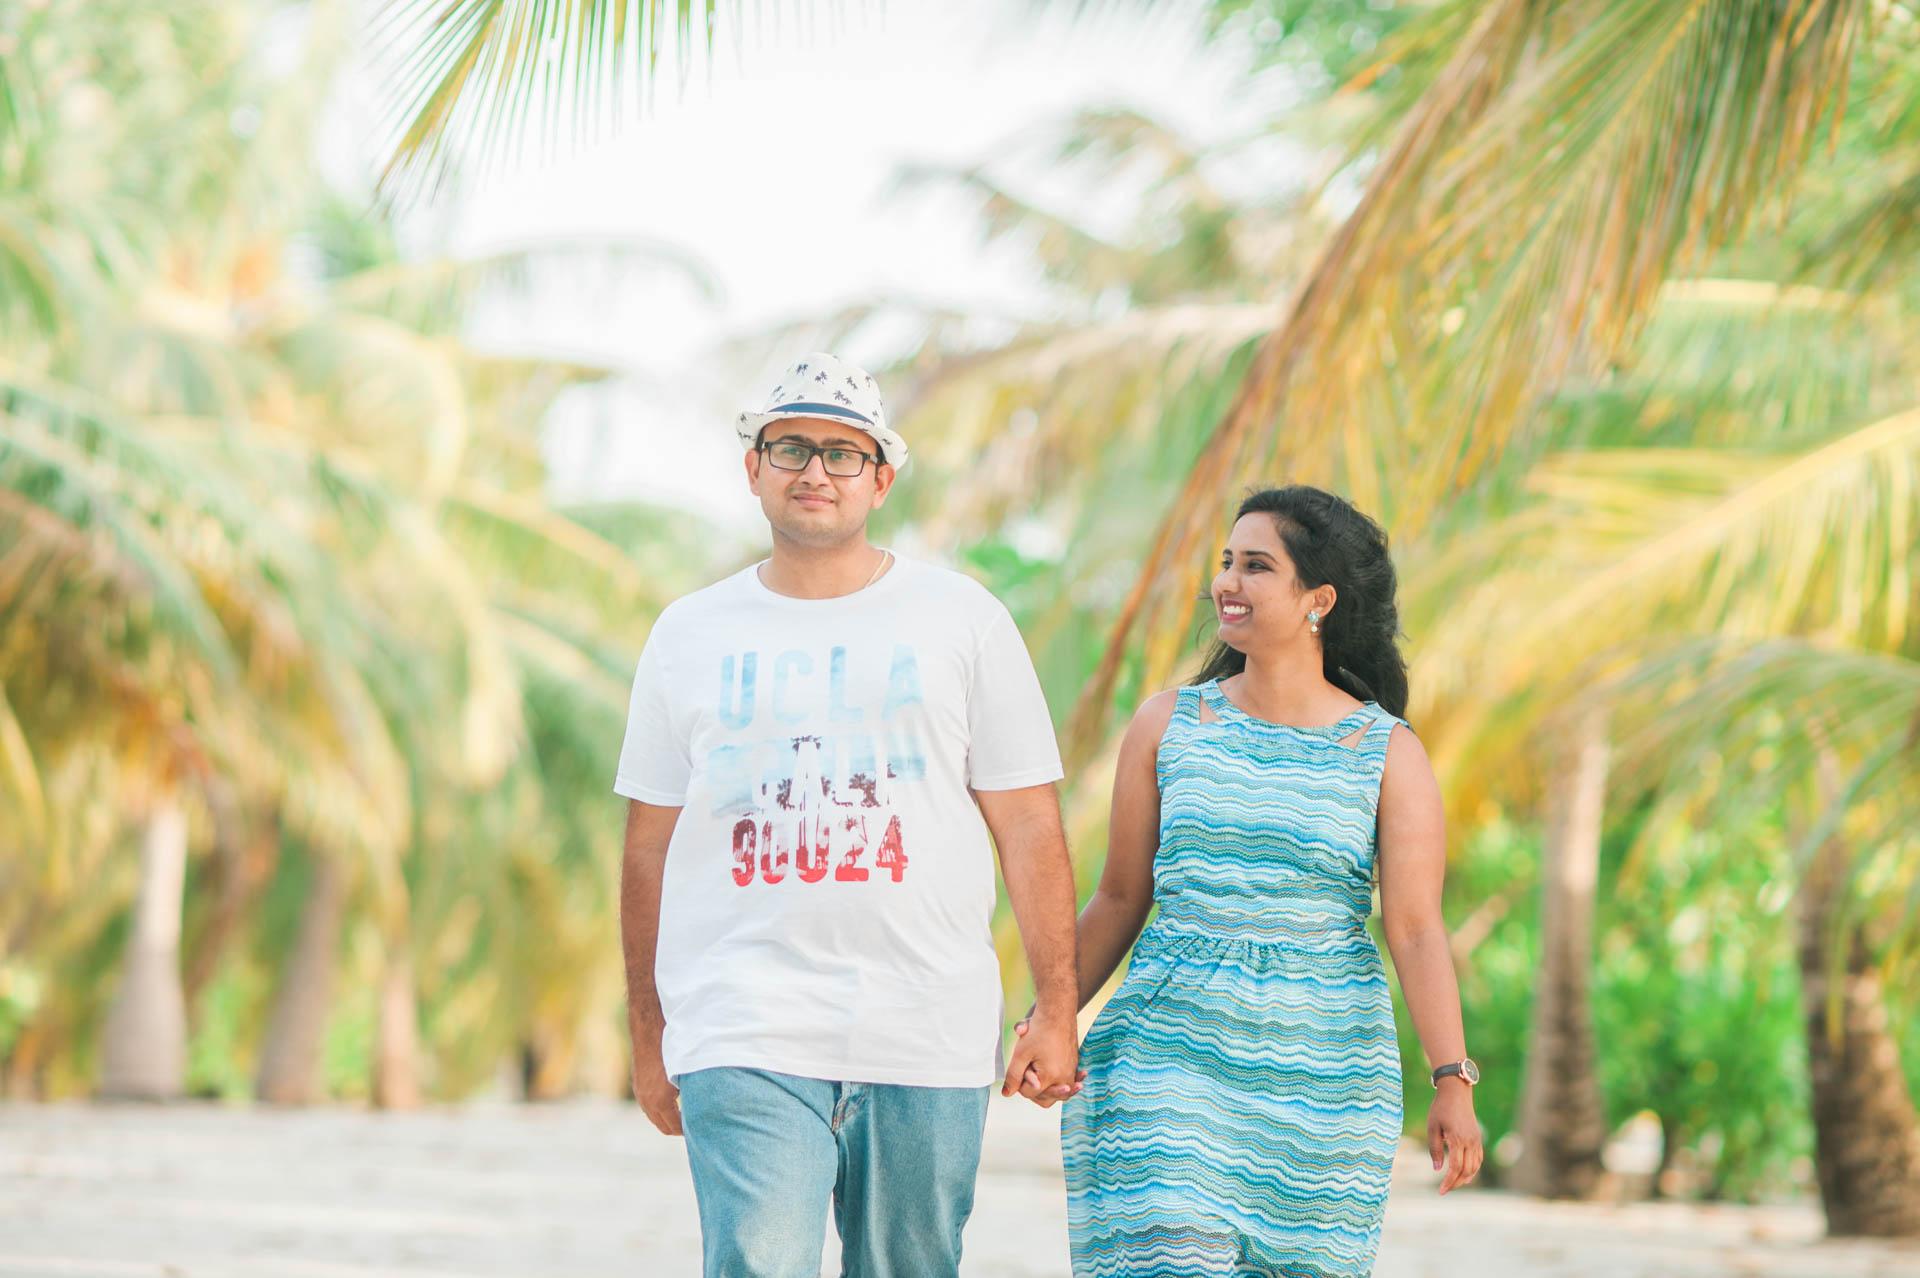 Sidhu and Agasthyas Anniversary Couple Photoshoot at Paradise Island Resort 7